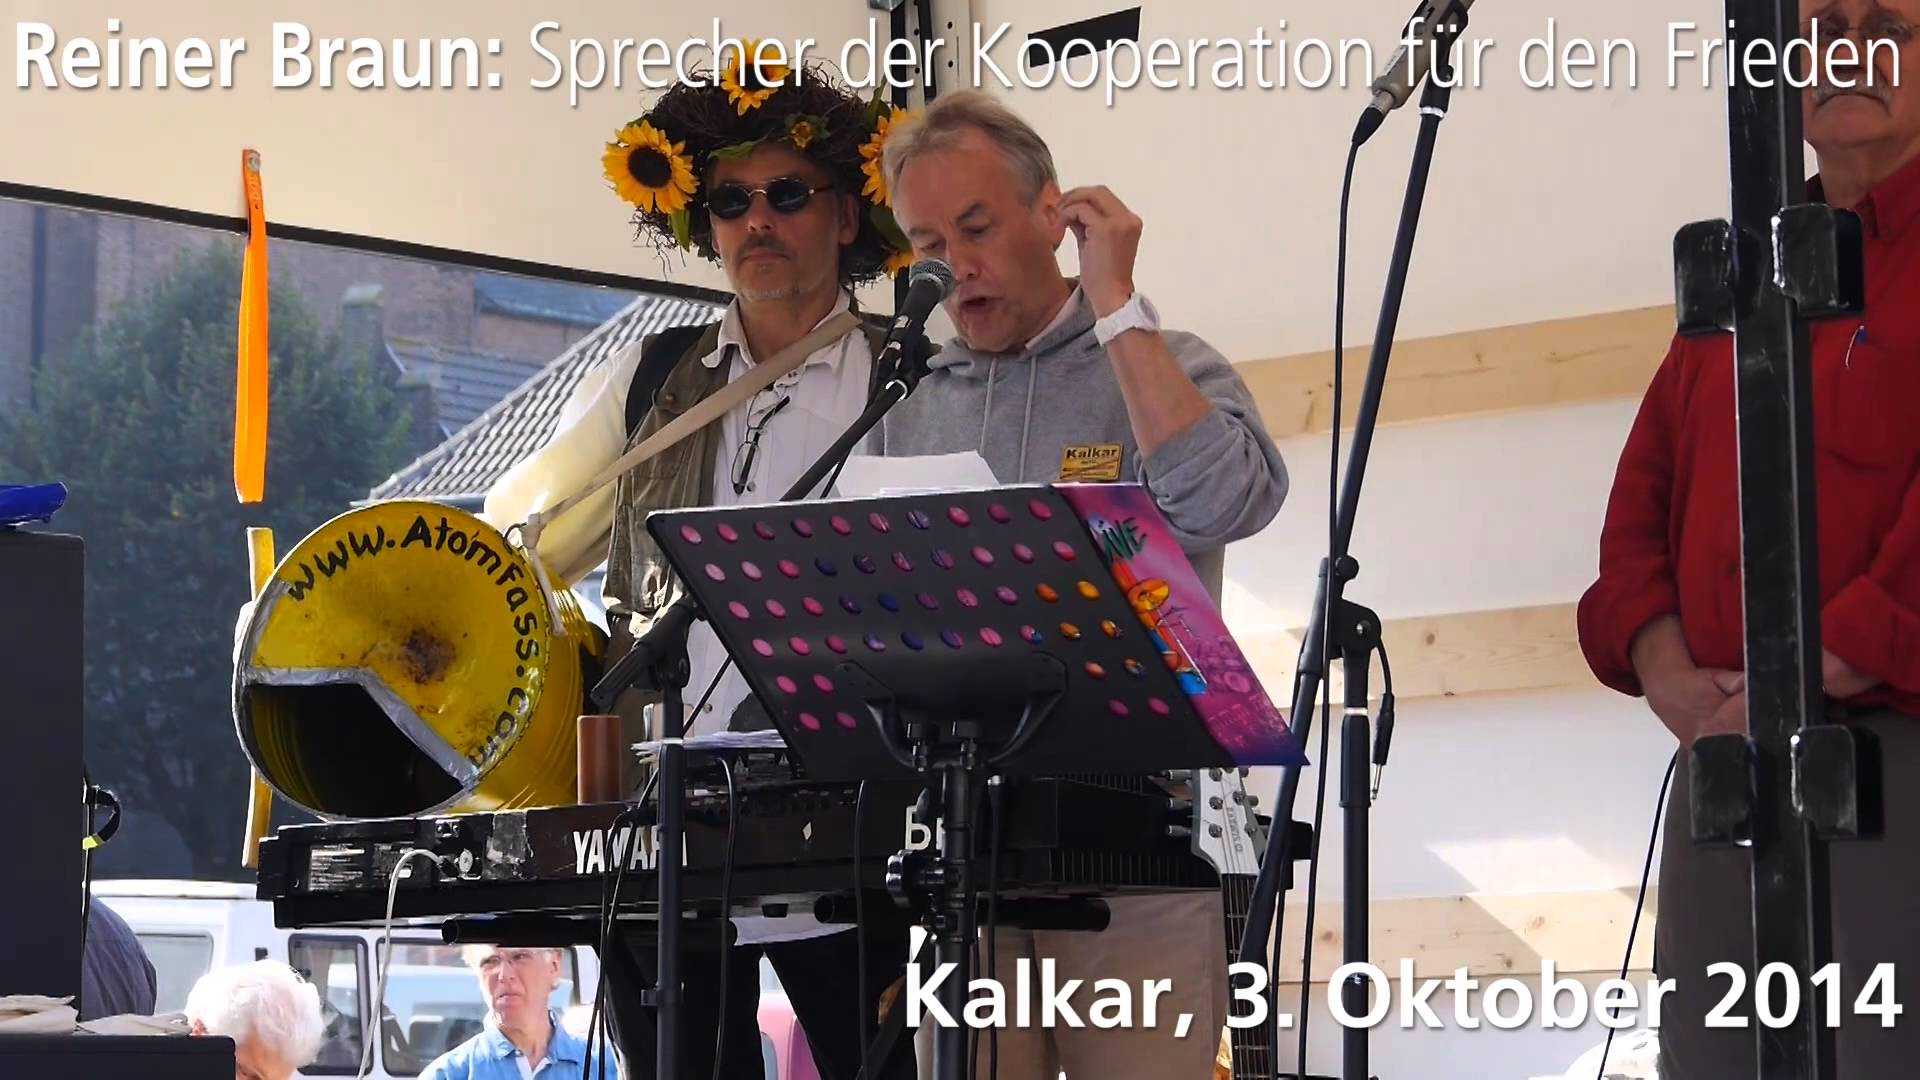 Rede Reiner Braun (IALANA) am 03.10.2014